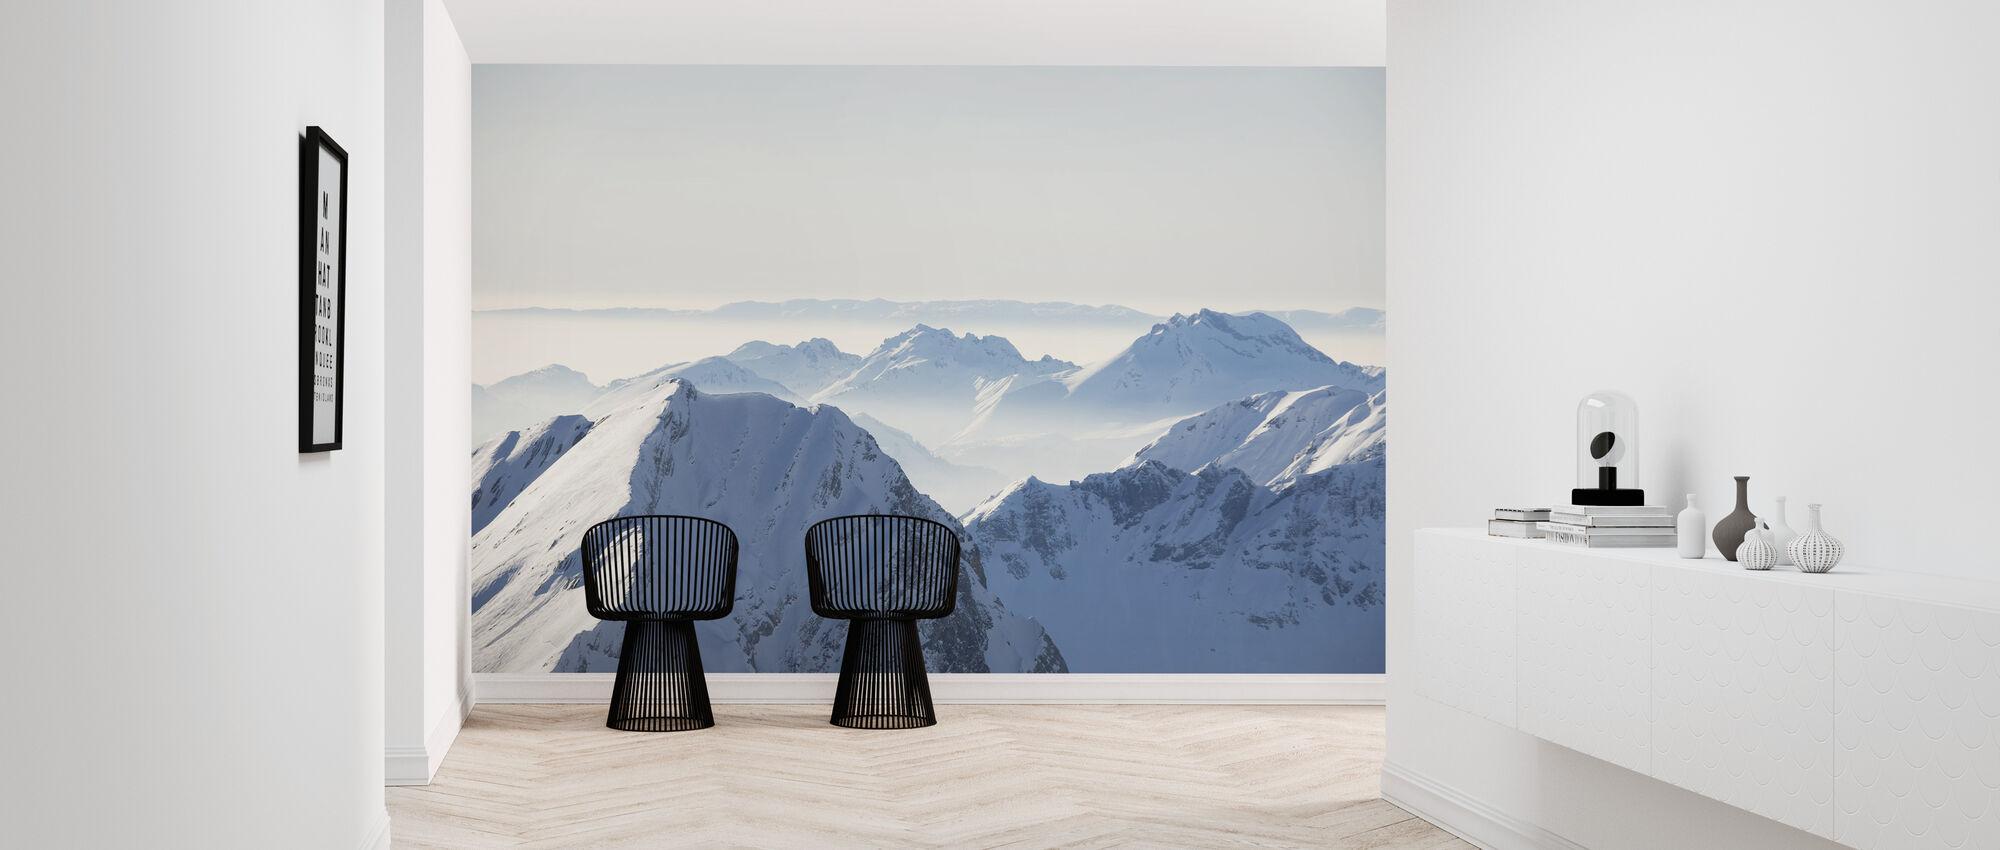 Chamonix Alps II, France - Wallpaper - Hallway